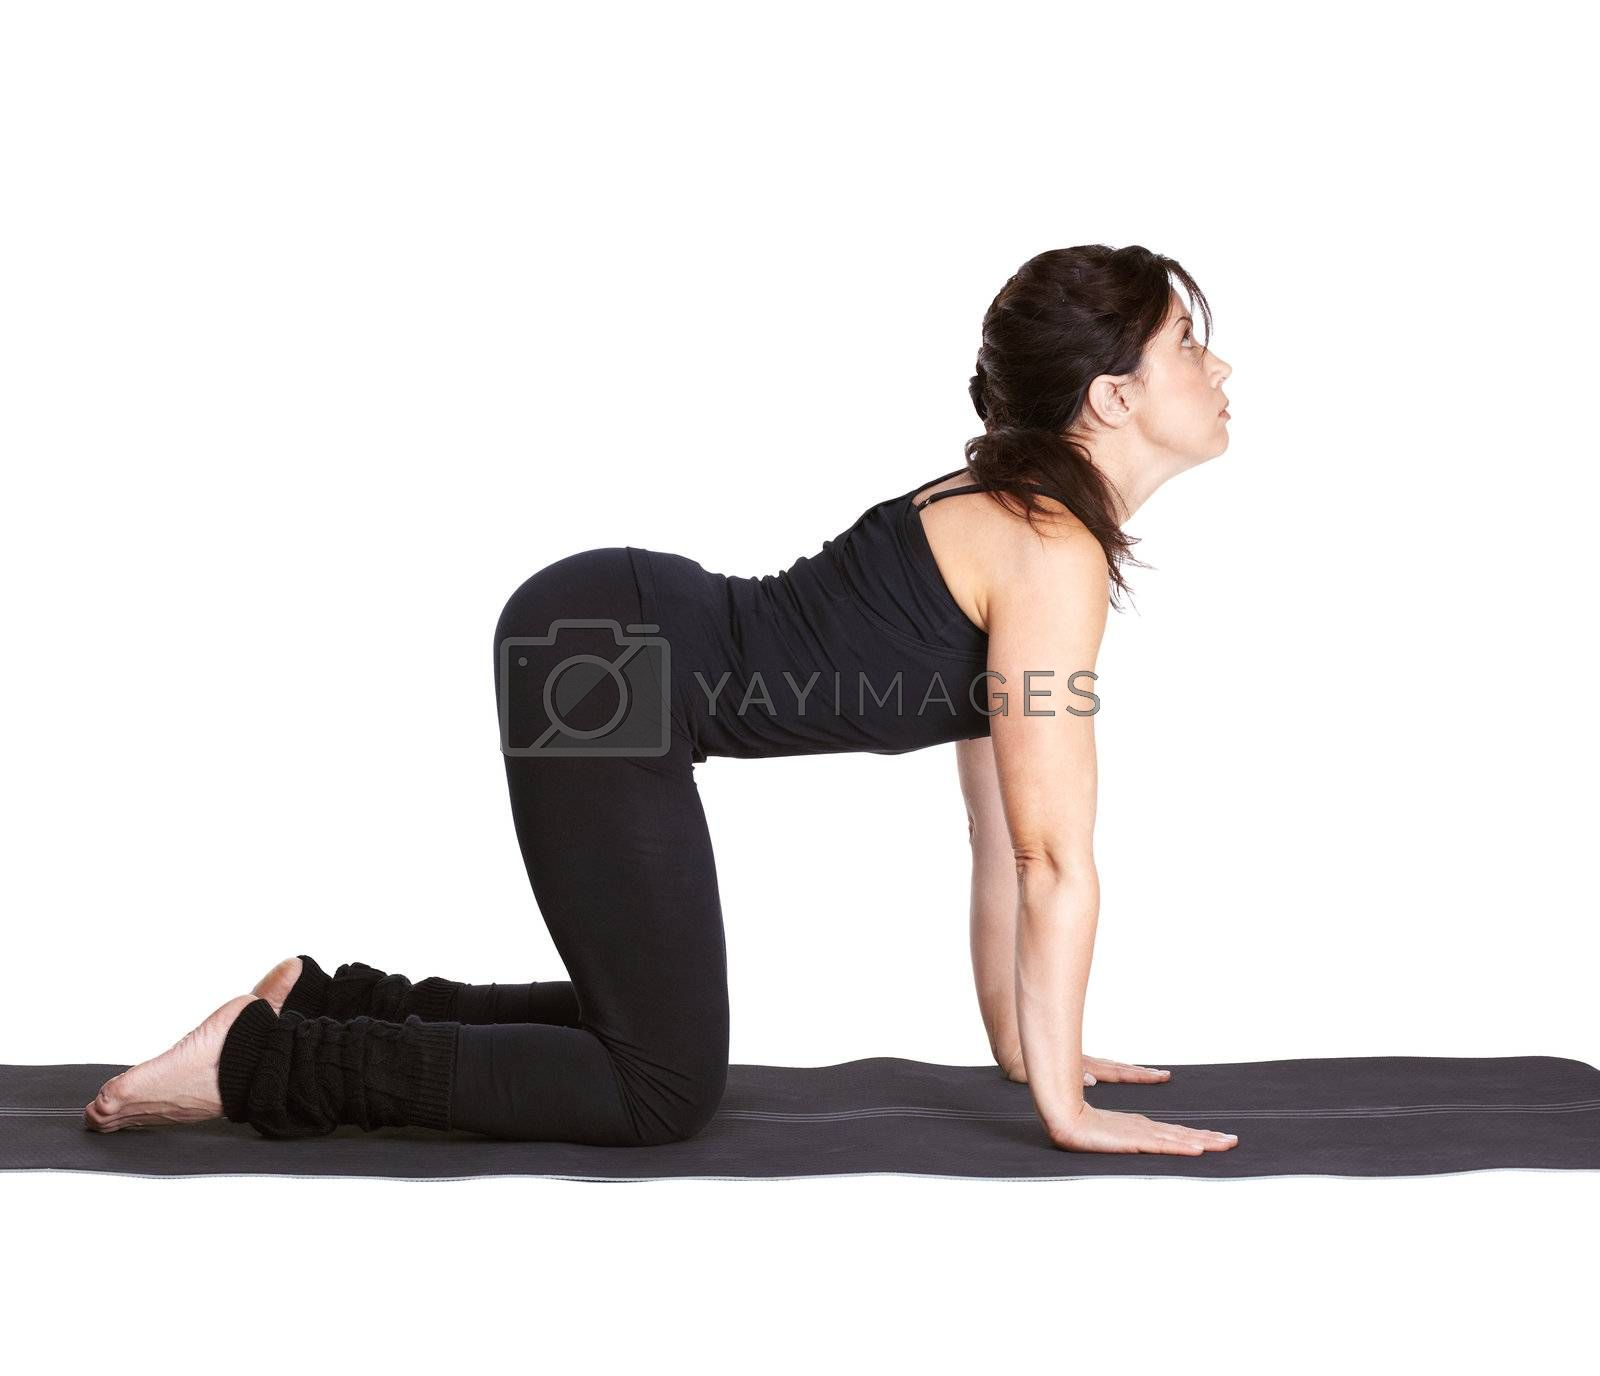 full-length portrait of beautiful woman working out yoga exercise dog pose mardzhariasana on fitness mat